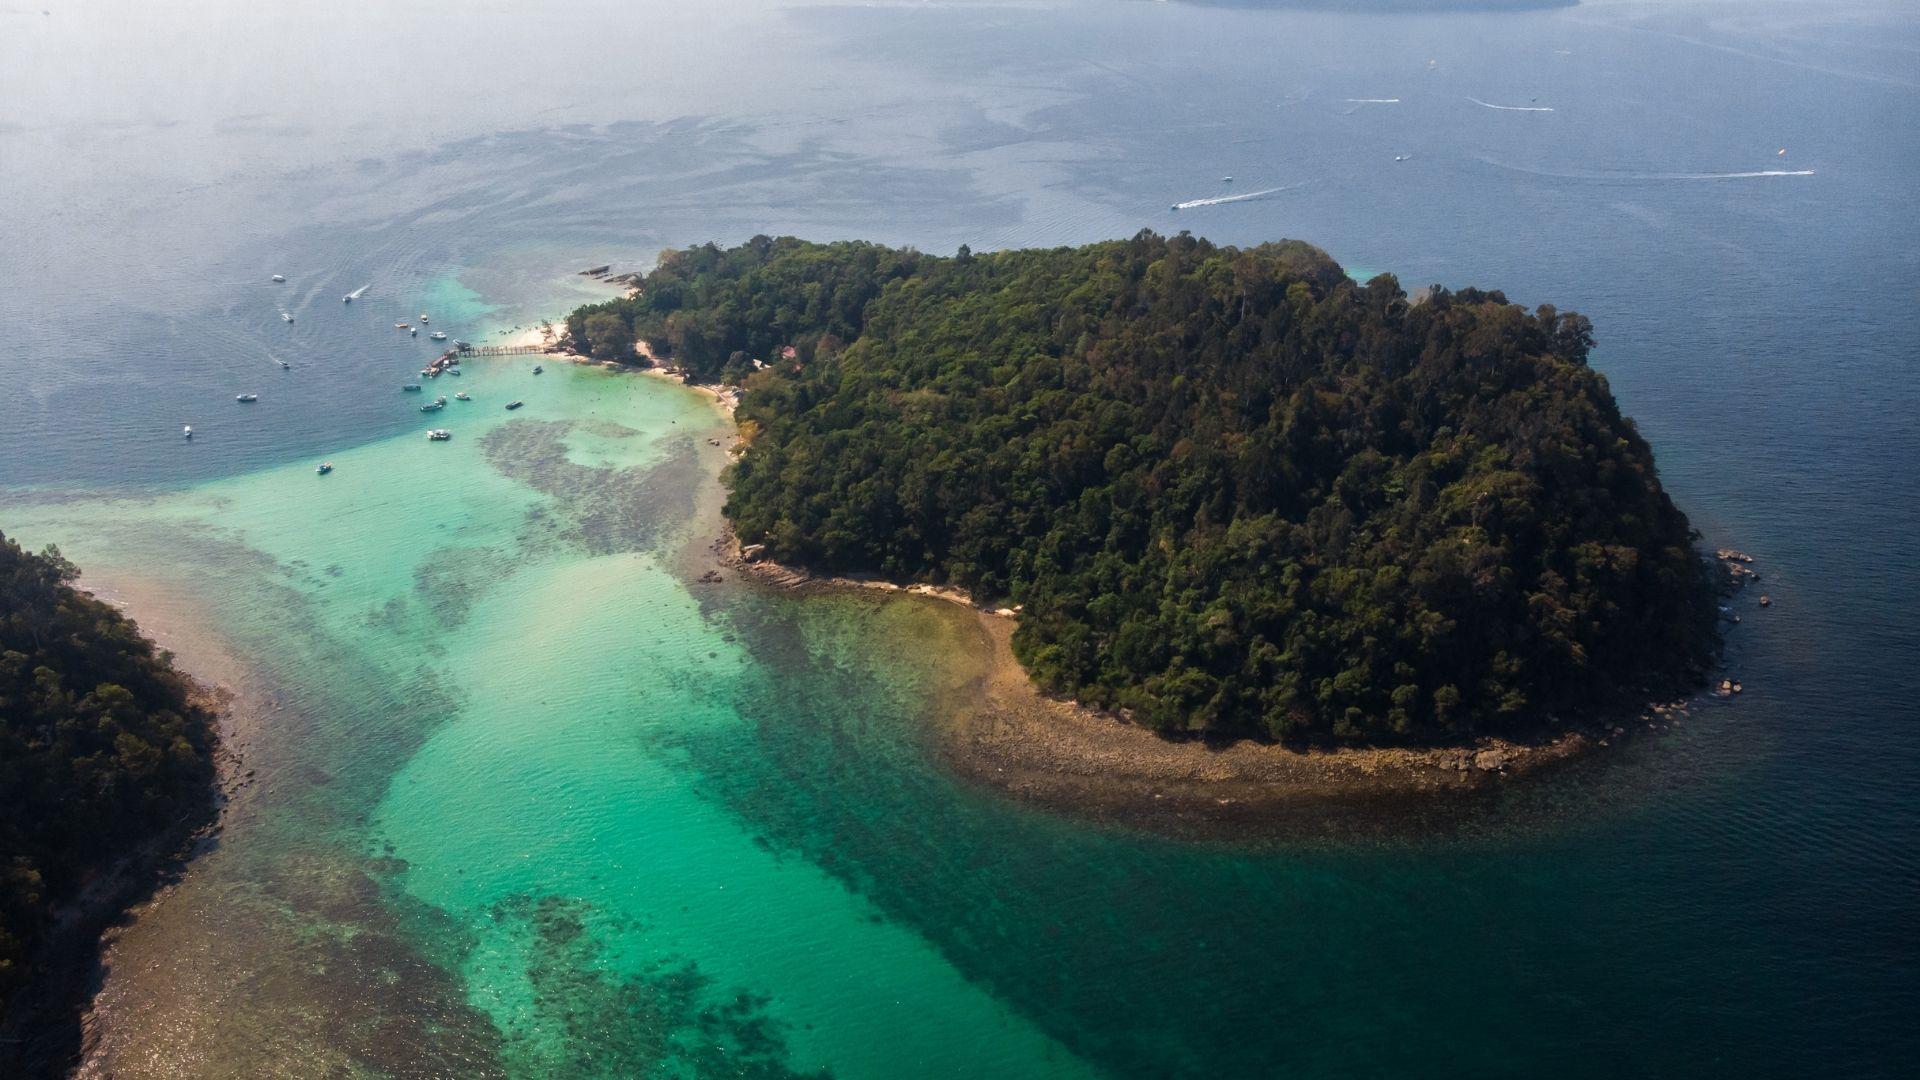 costa de malasia